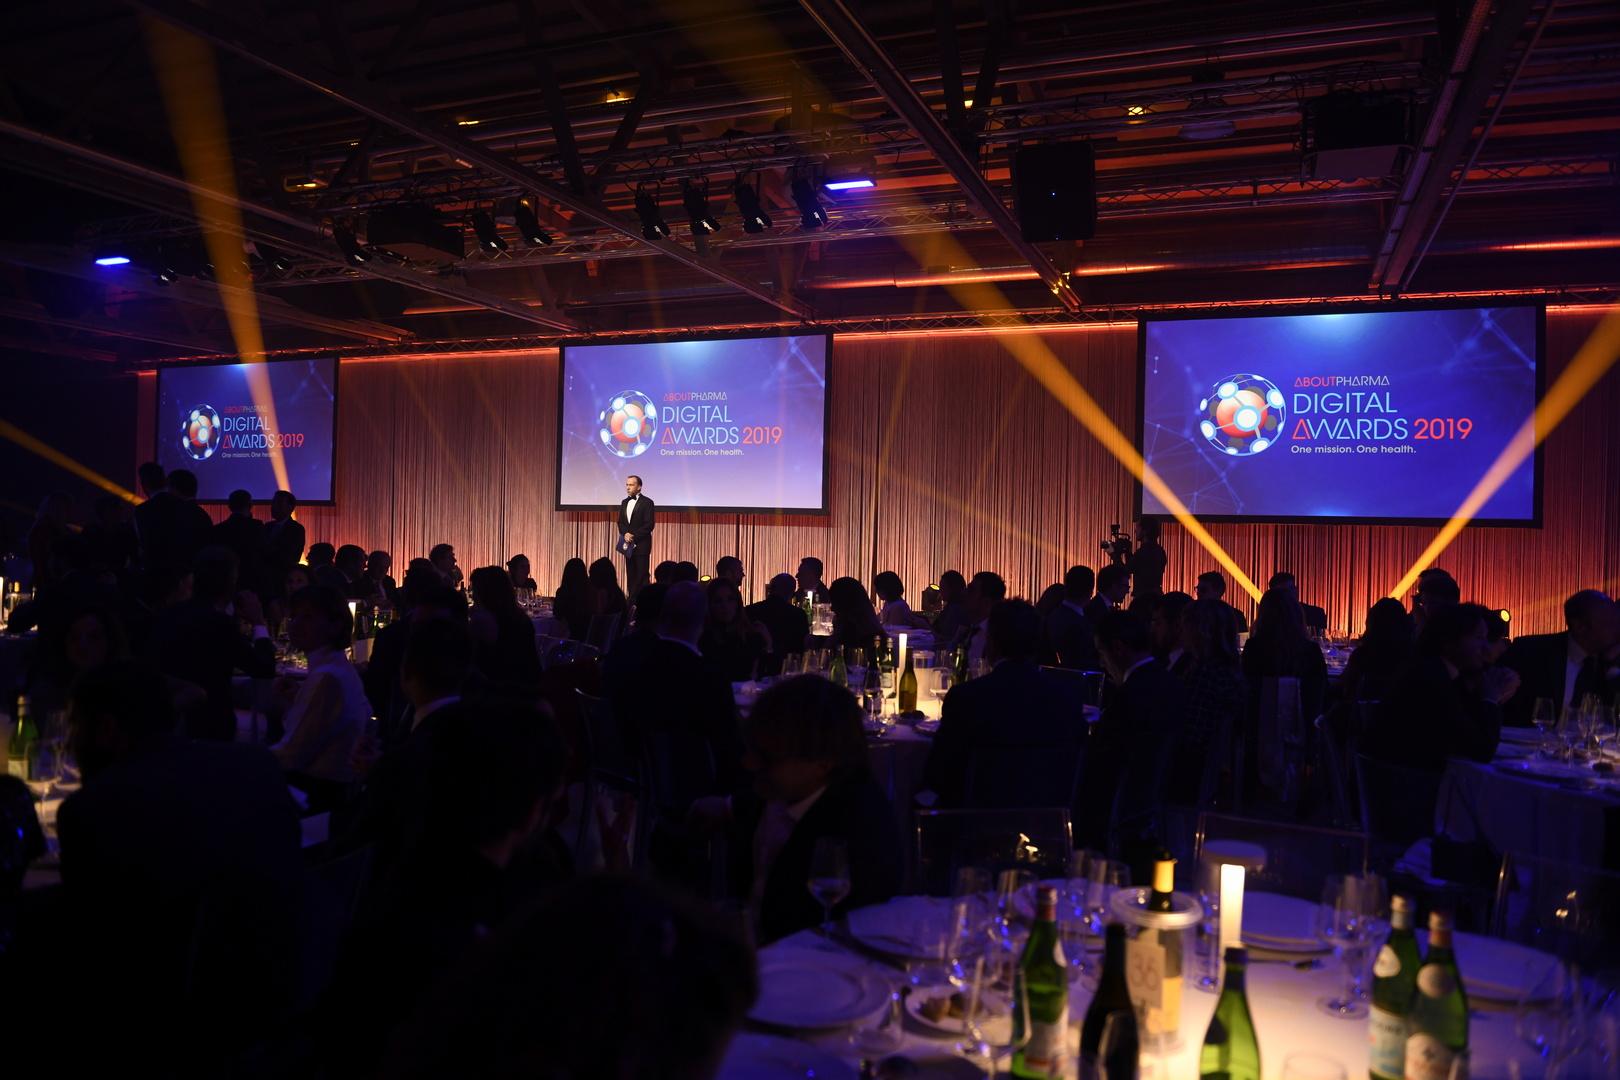 AboutPharma Digital Awards 2019 (90)